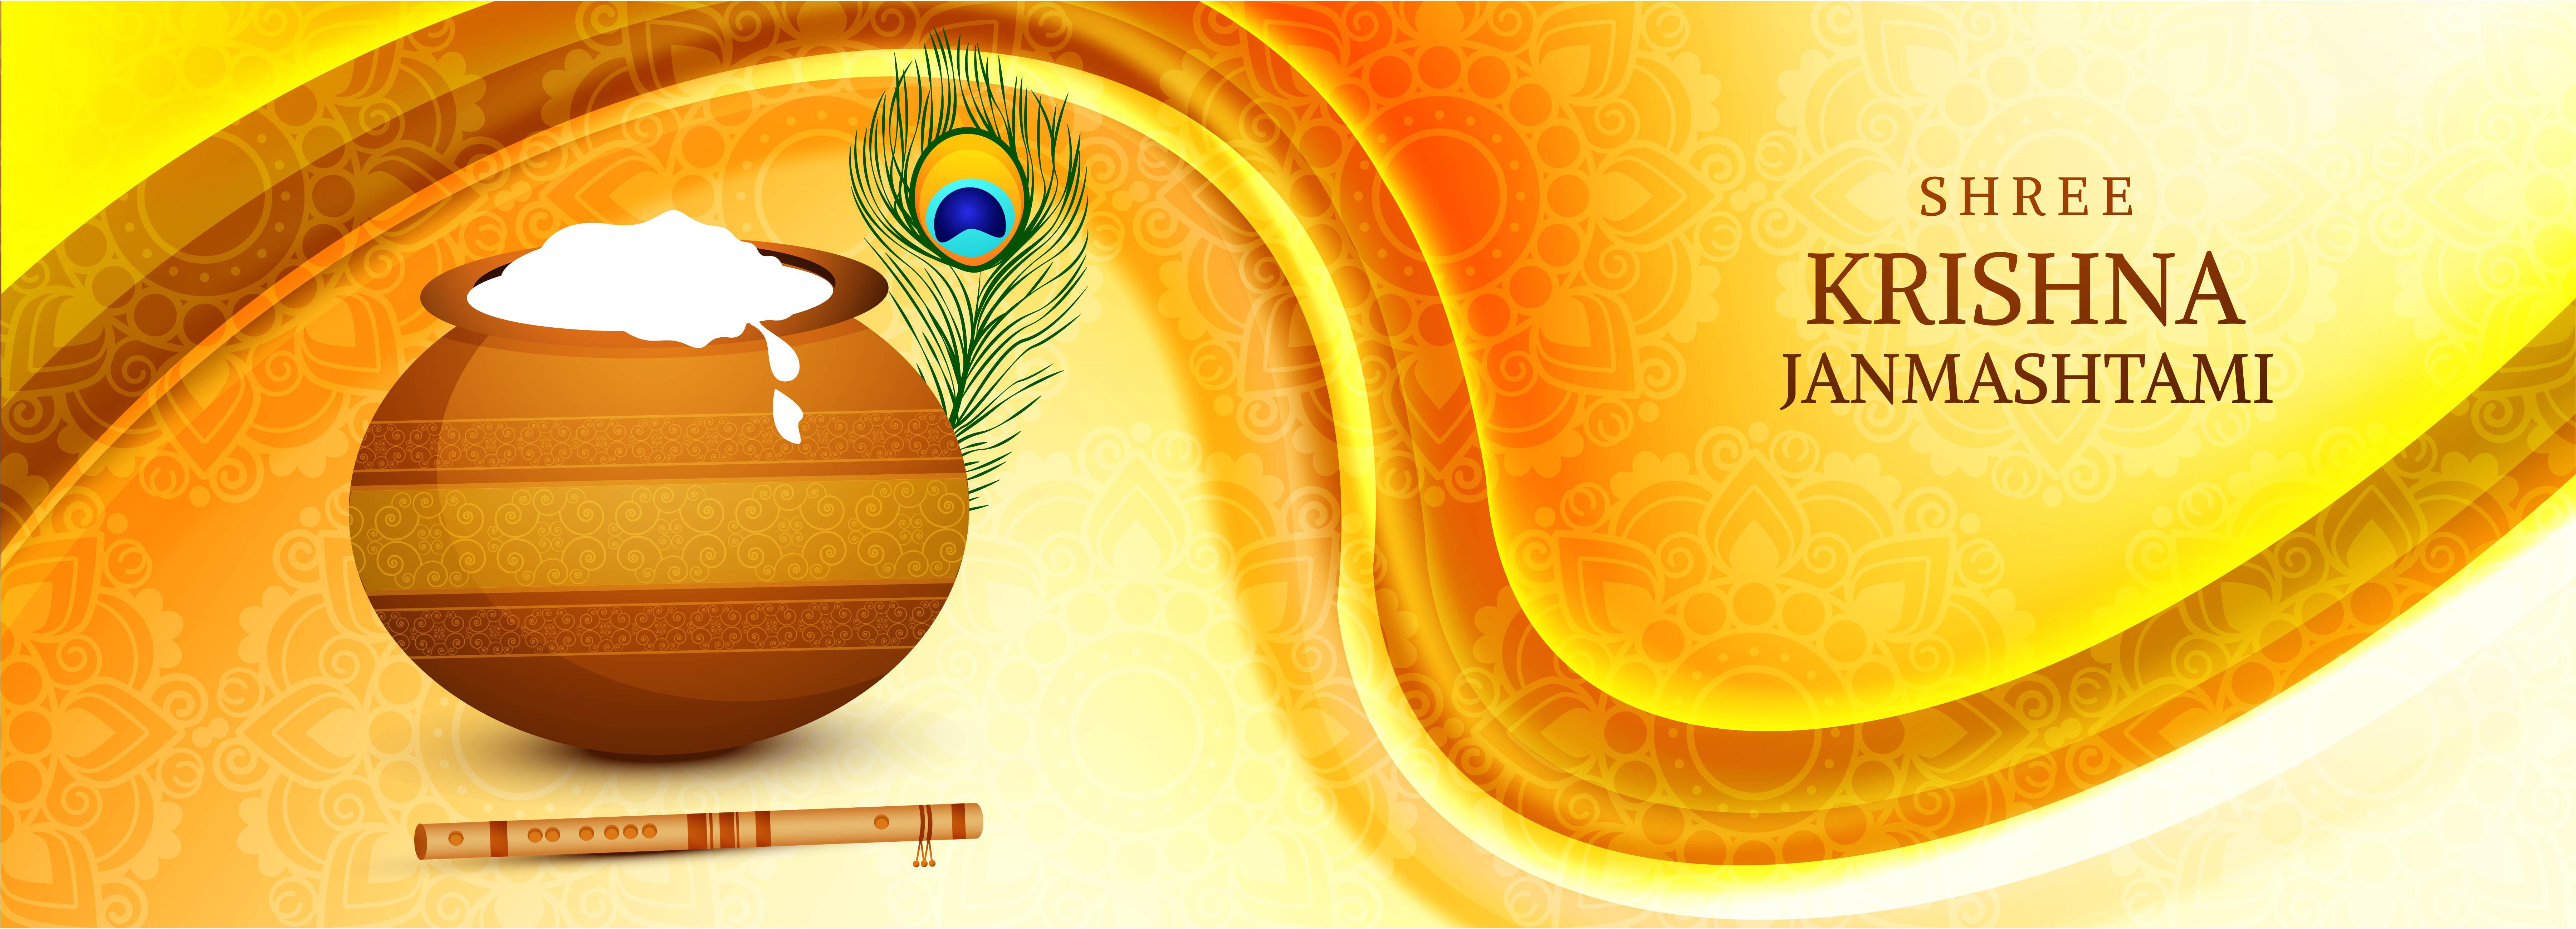 tarjeta del festival krishna janmashtami con banner de ollas